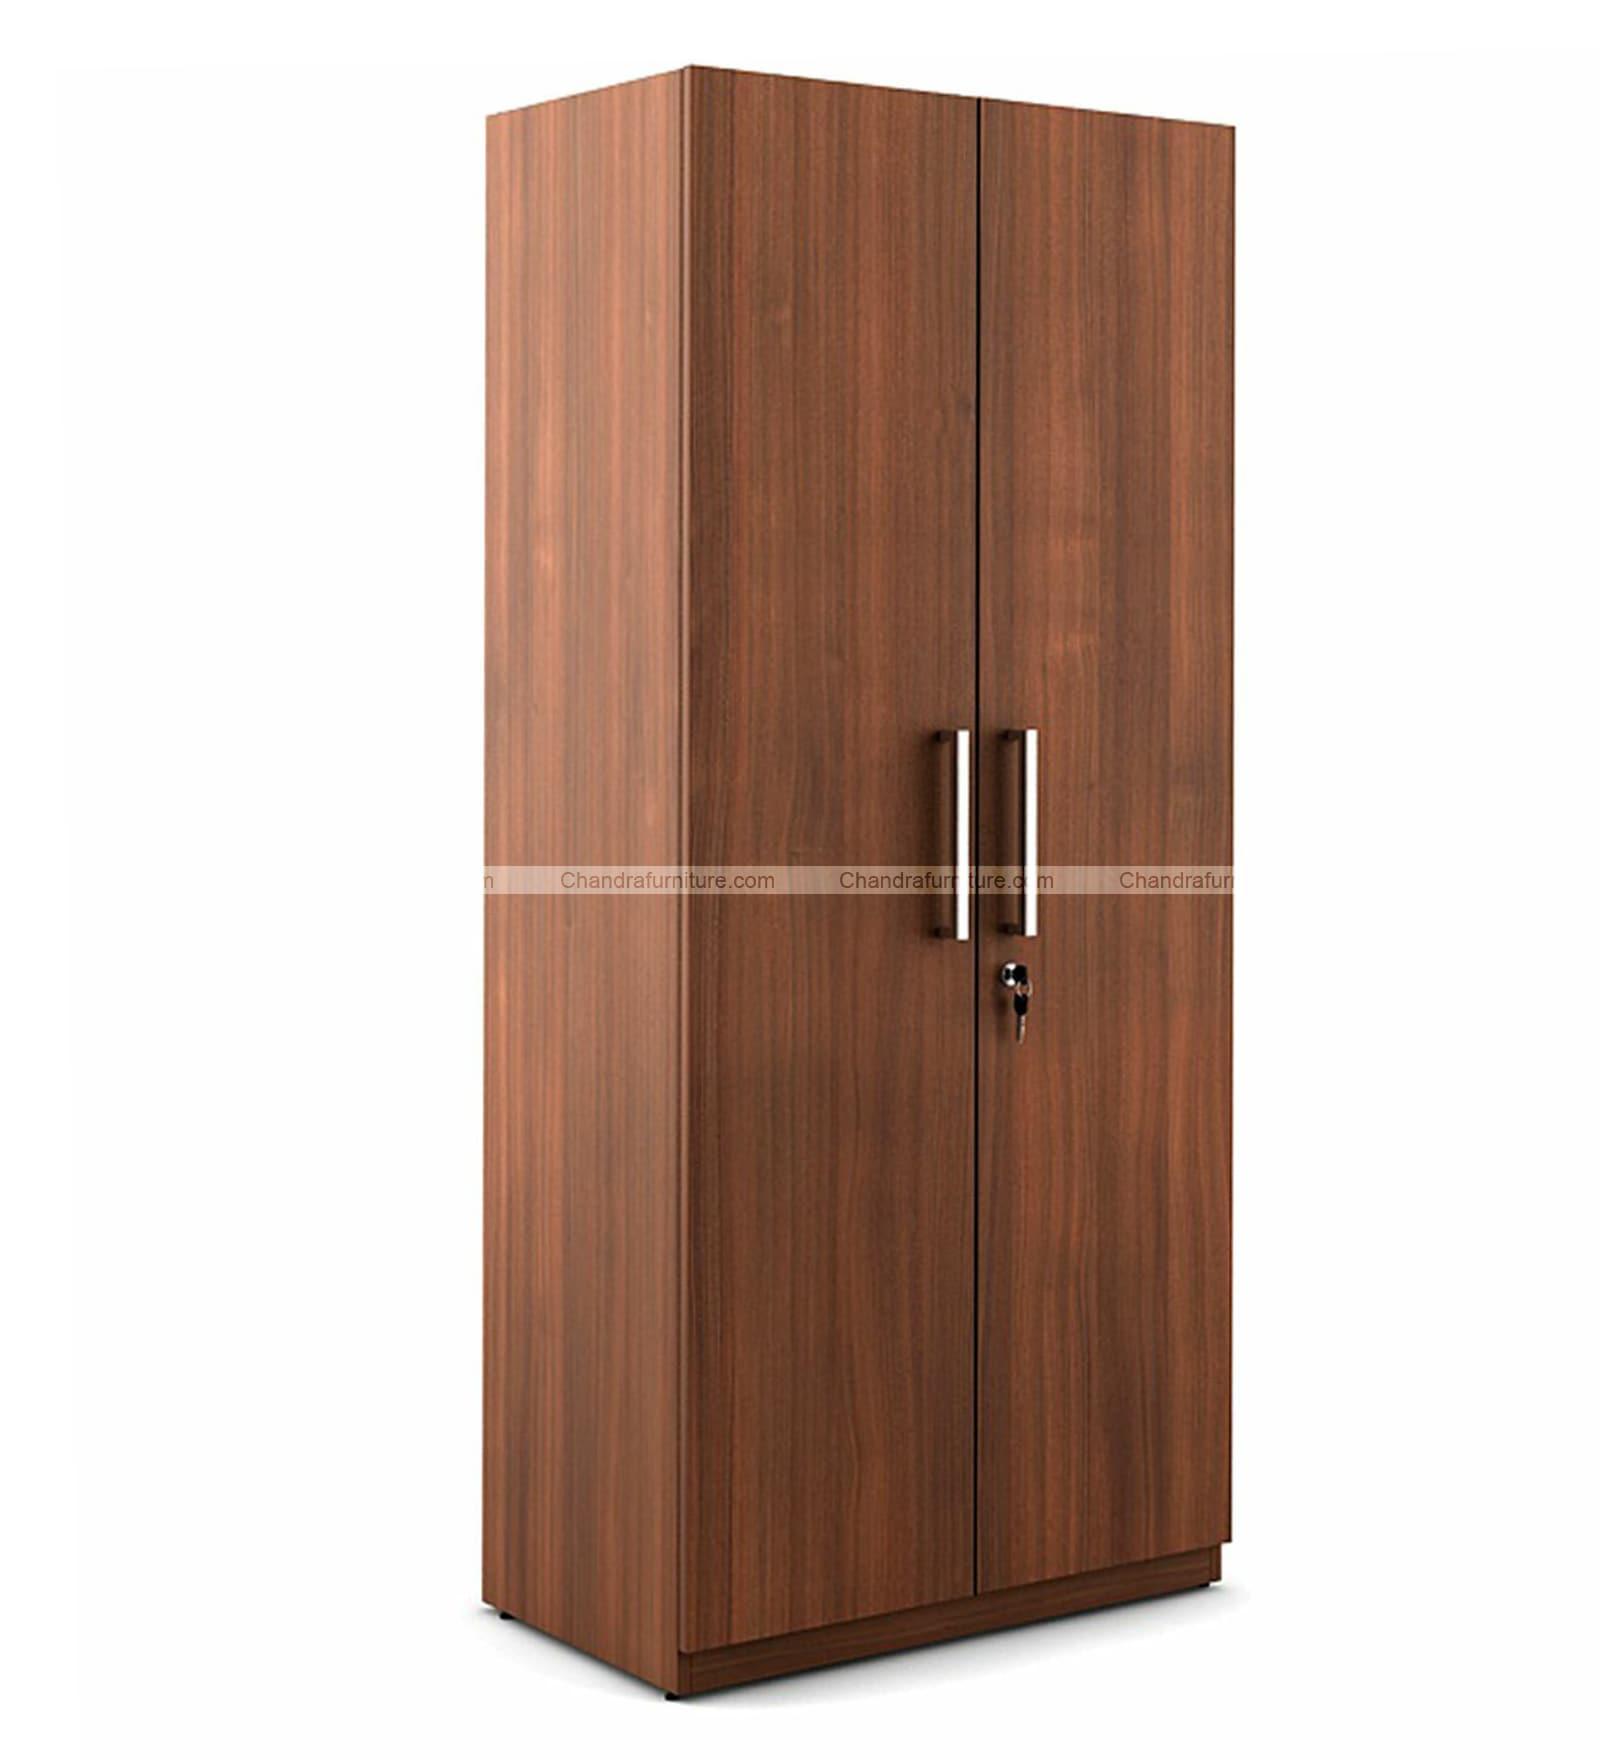 Chandra Furniture Eco Two Door Wardrobe Wood Colour